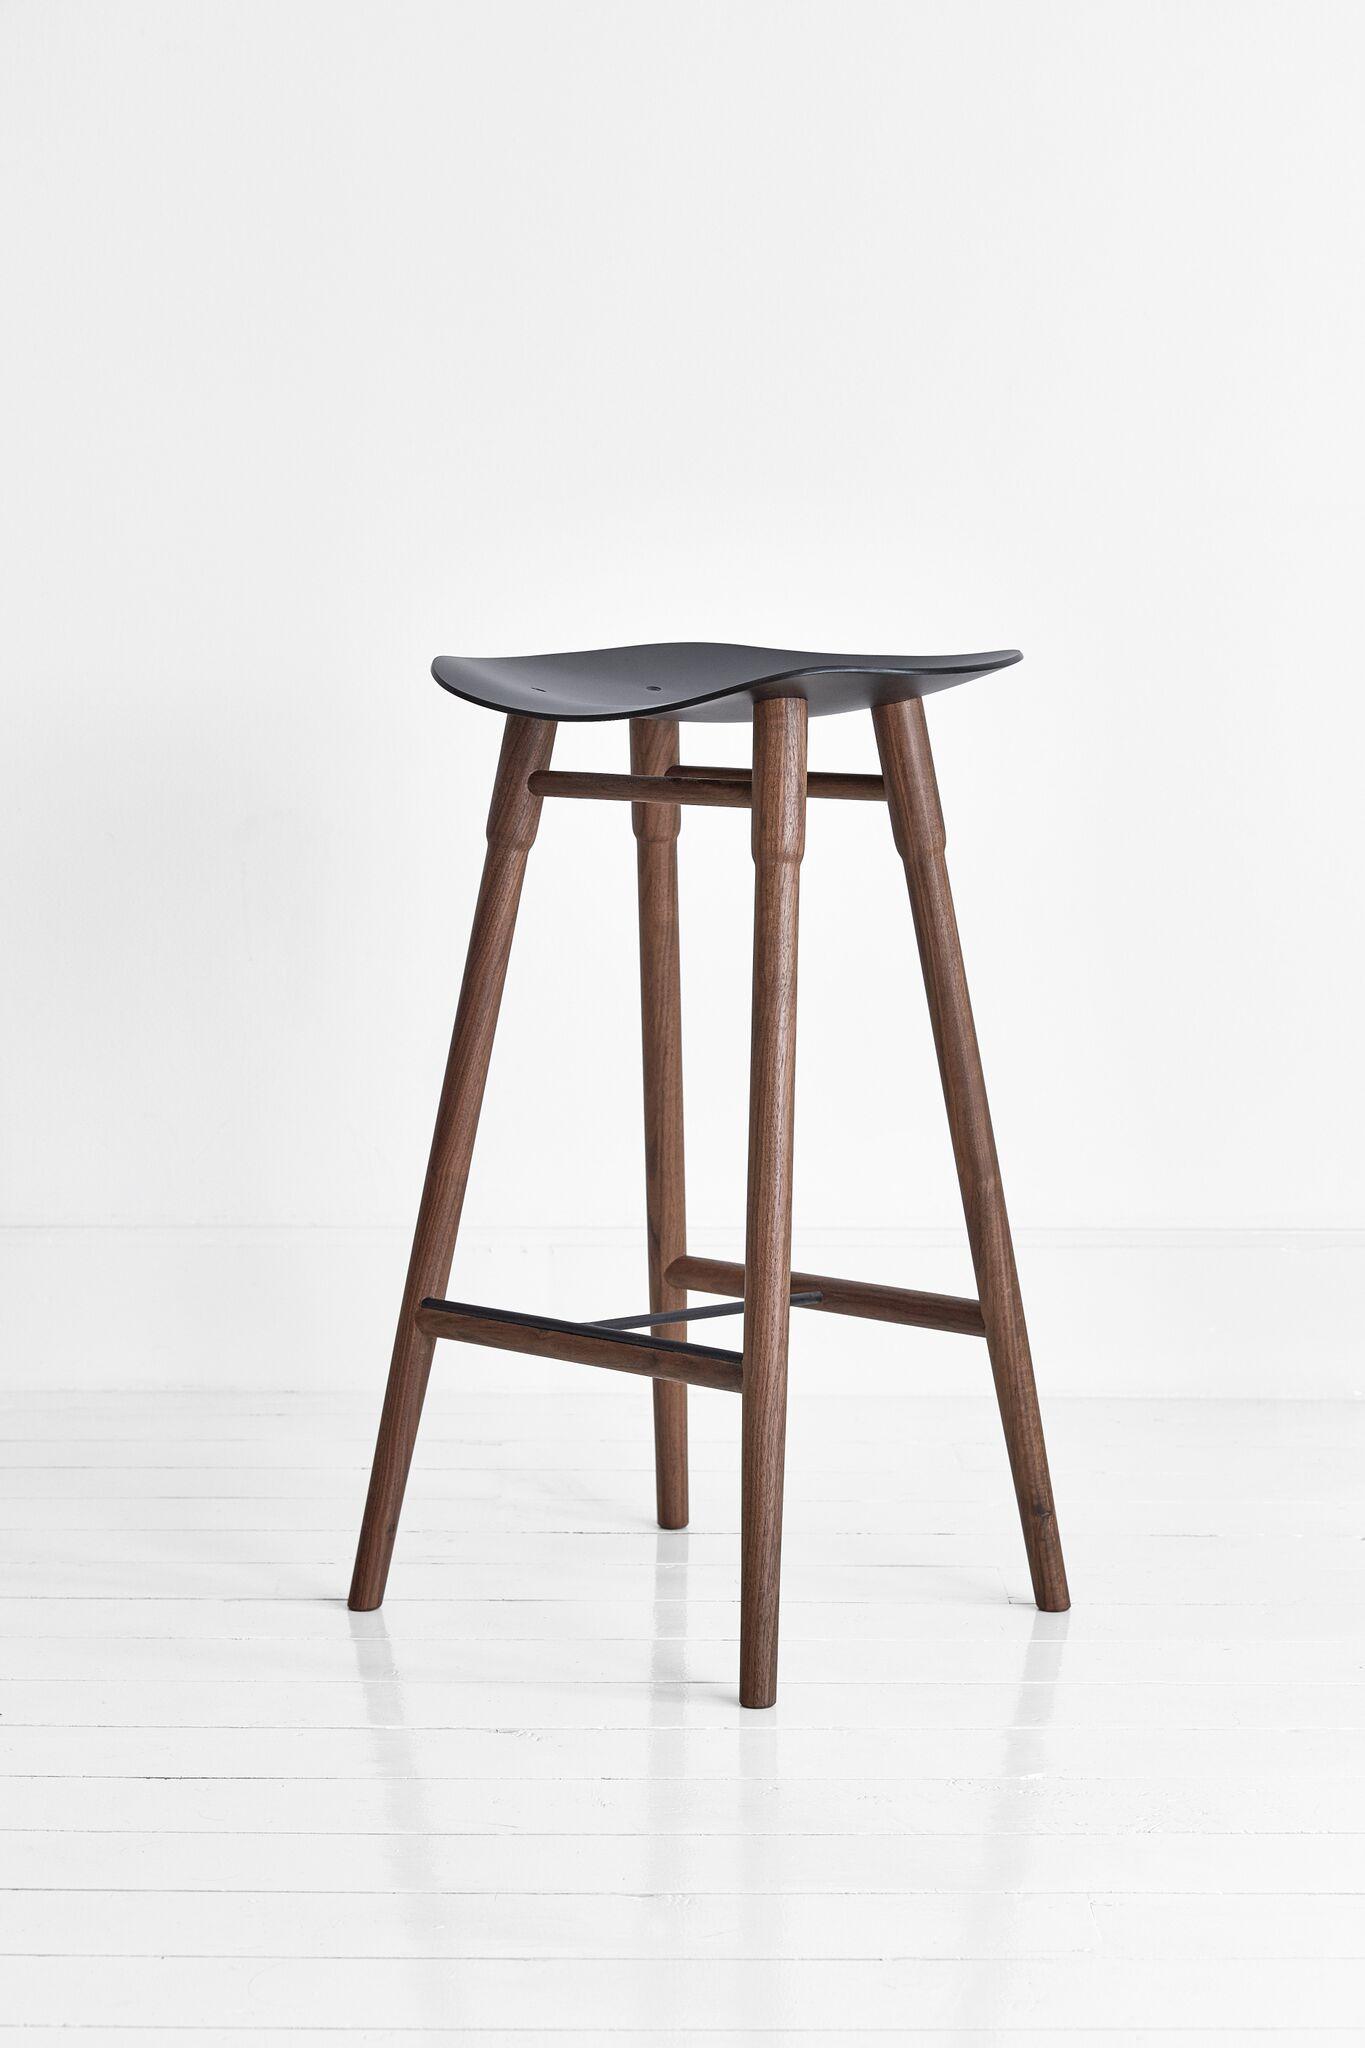 Gallery Of Dowel Stool By Mr.fräg Local Australian Furniture And Industrial Design Sydney, Nsw Image 6